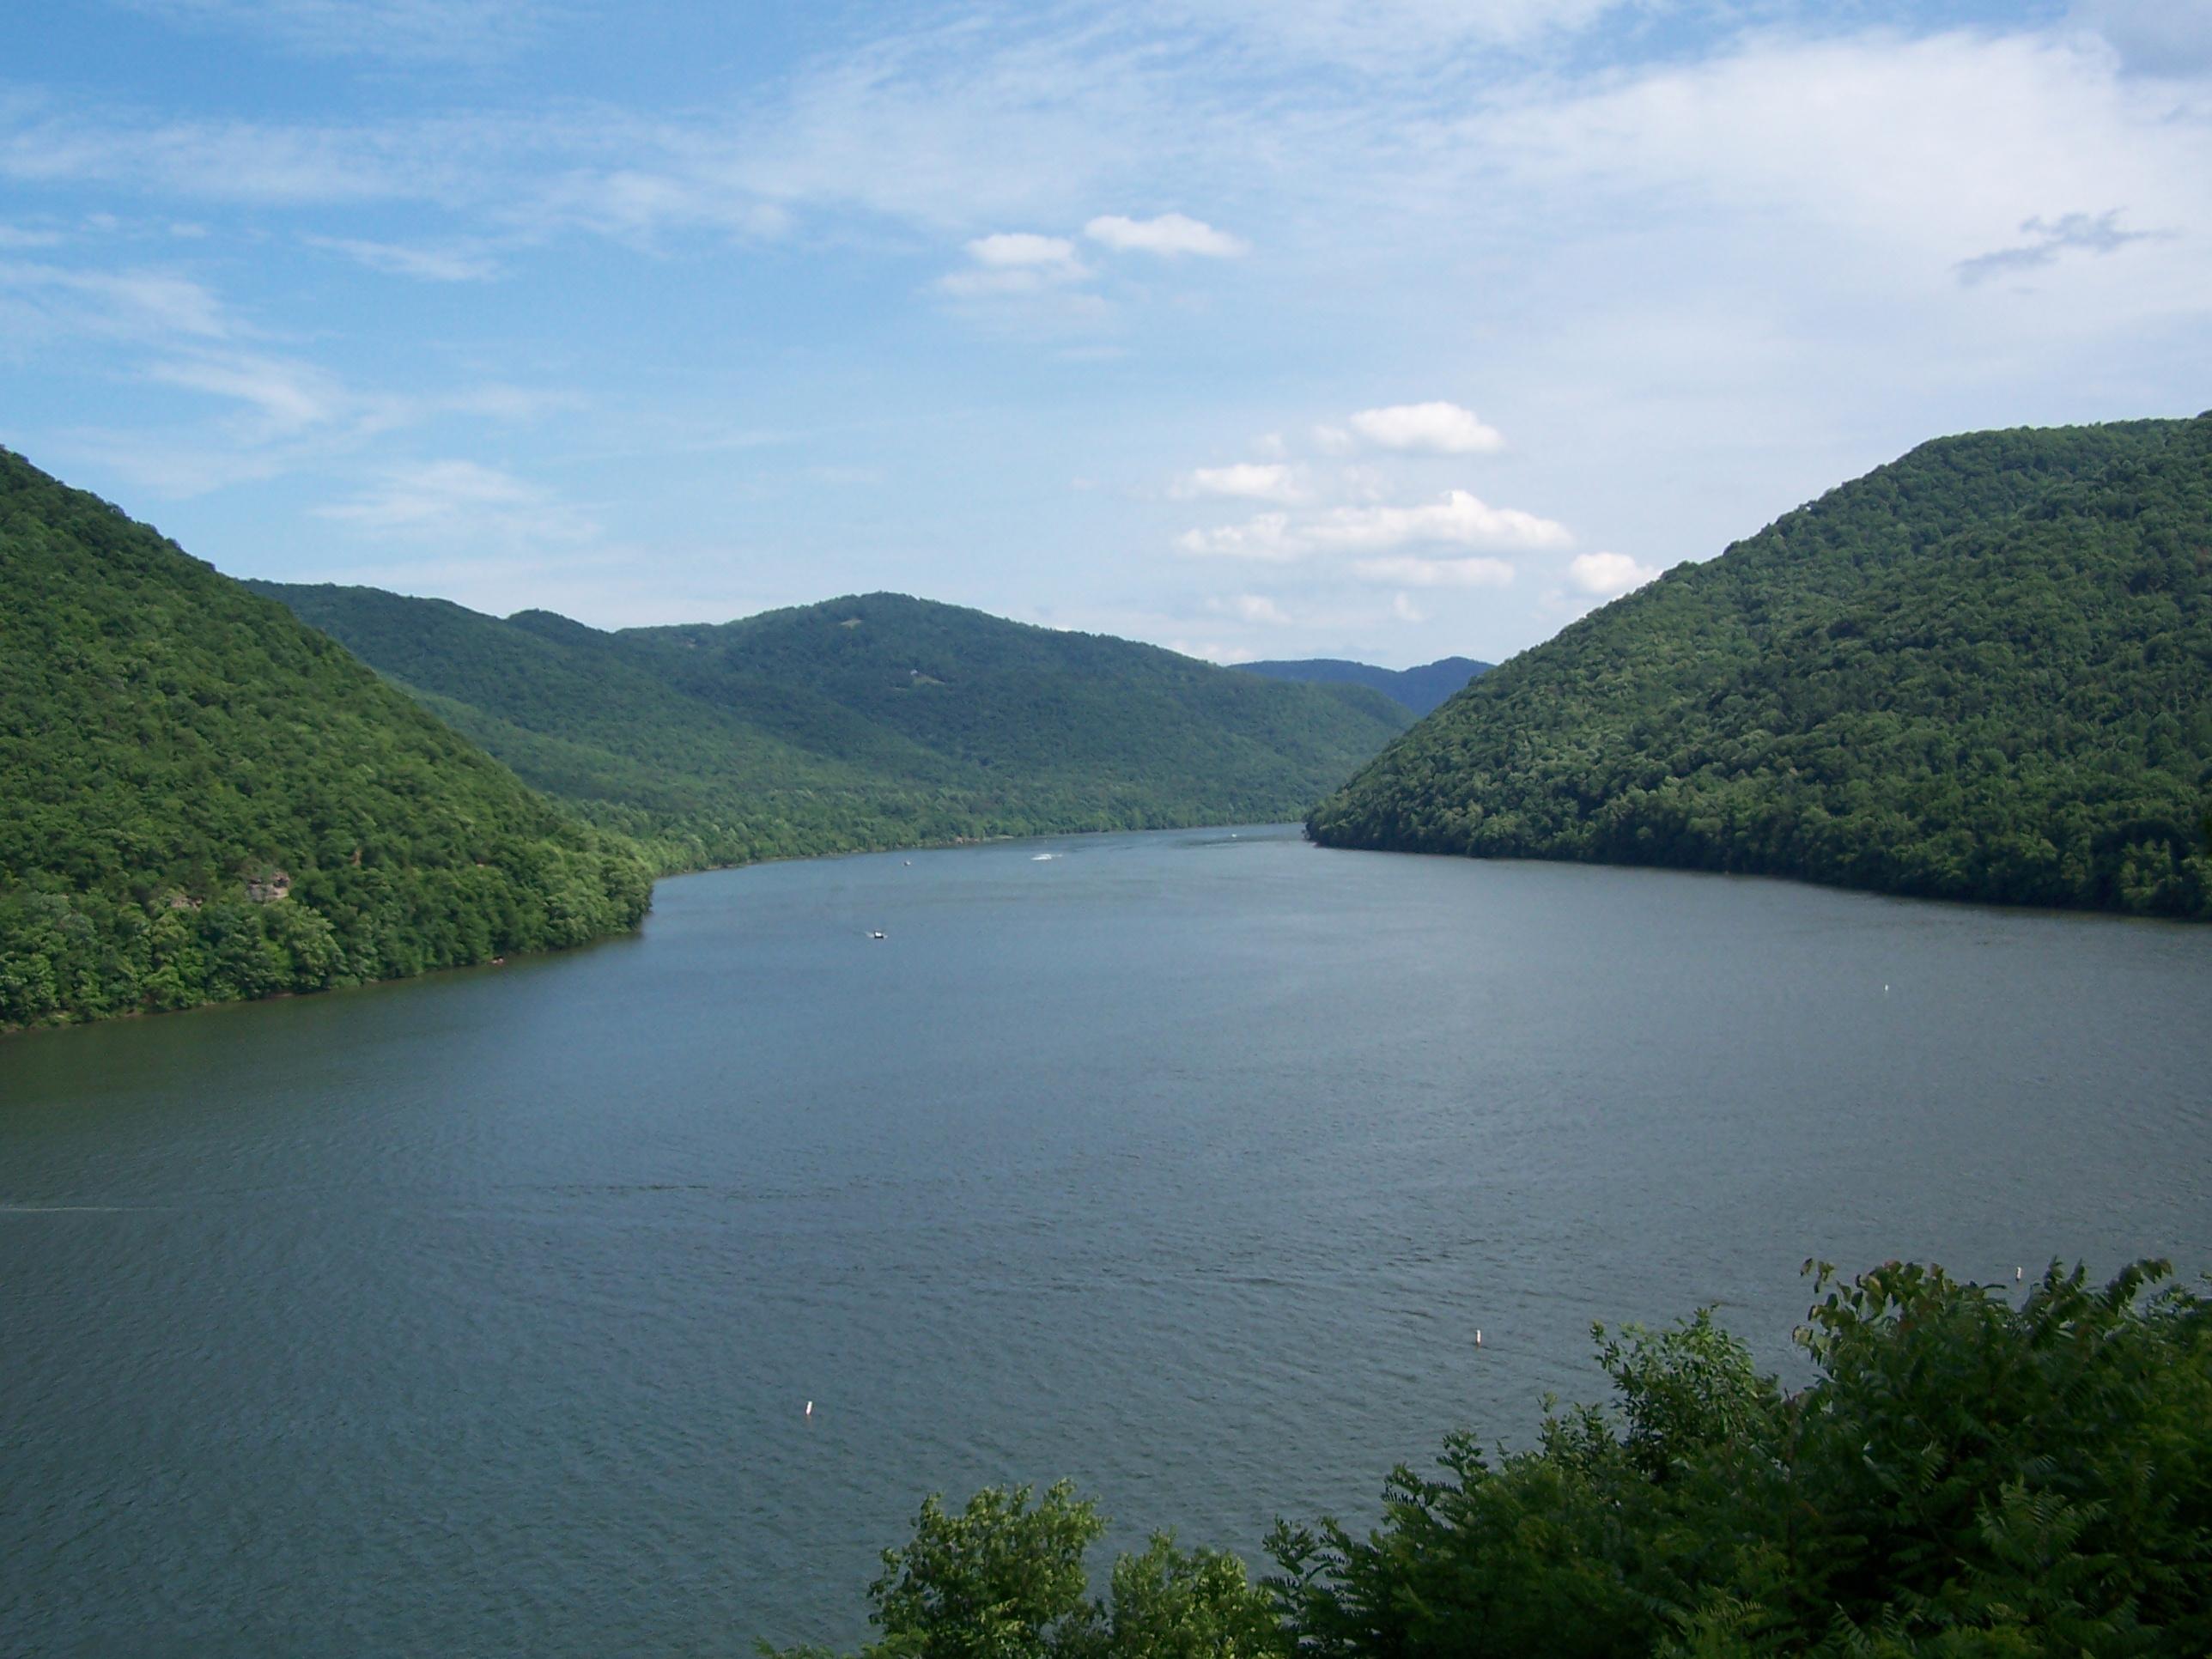 Bluestone Lake Scenic Overlook